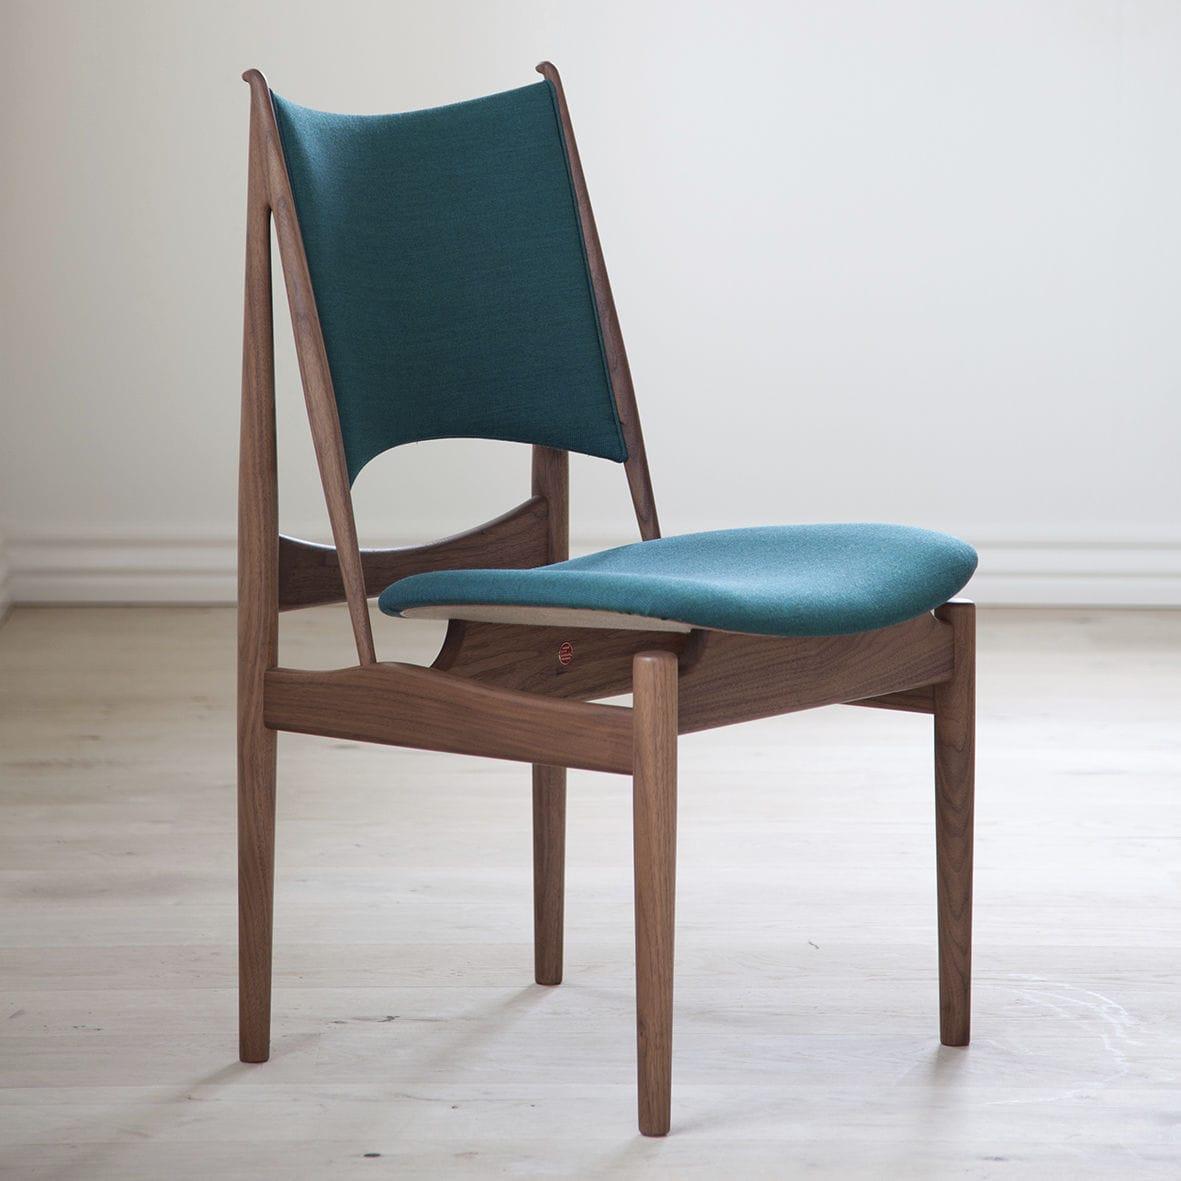 Scandinavian design chair fabric wooden leather EGYPTIAN